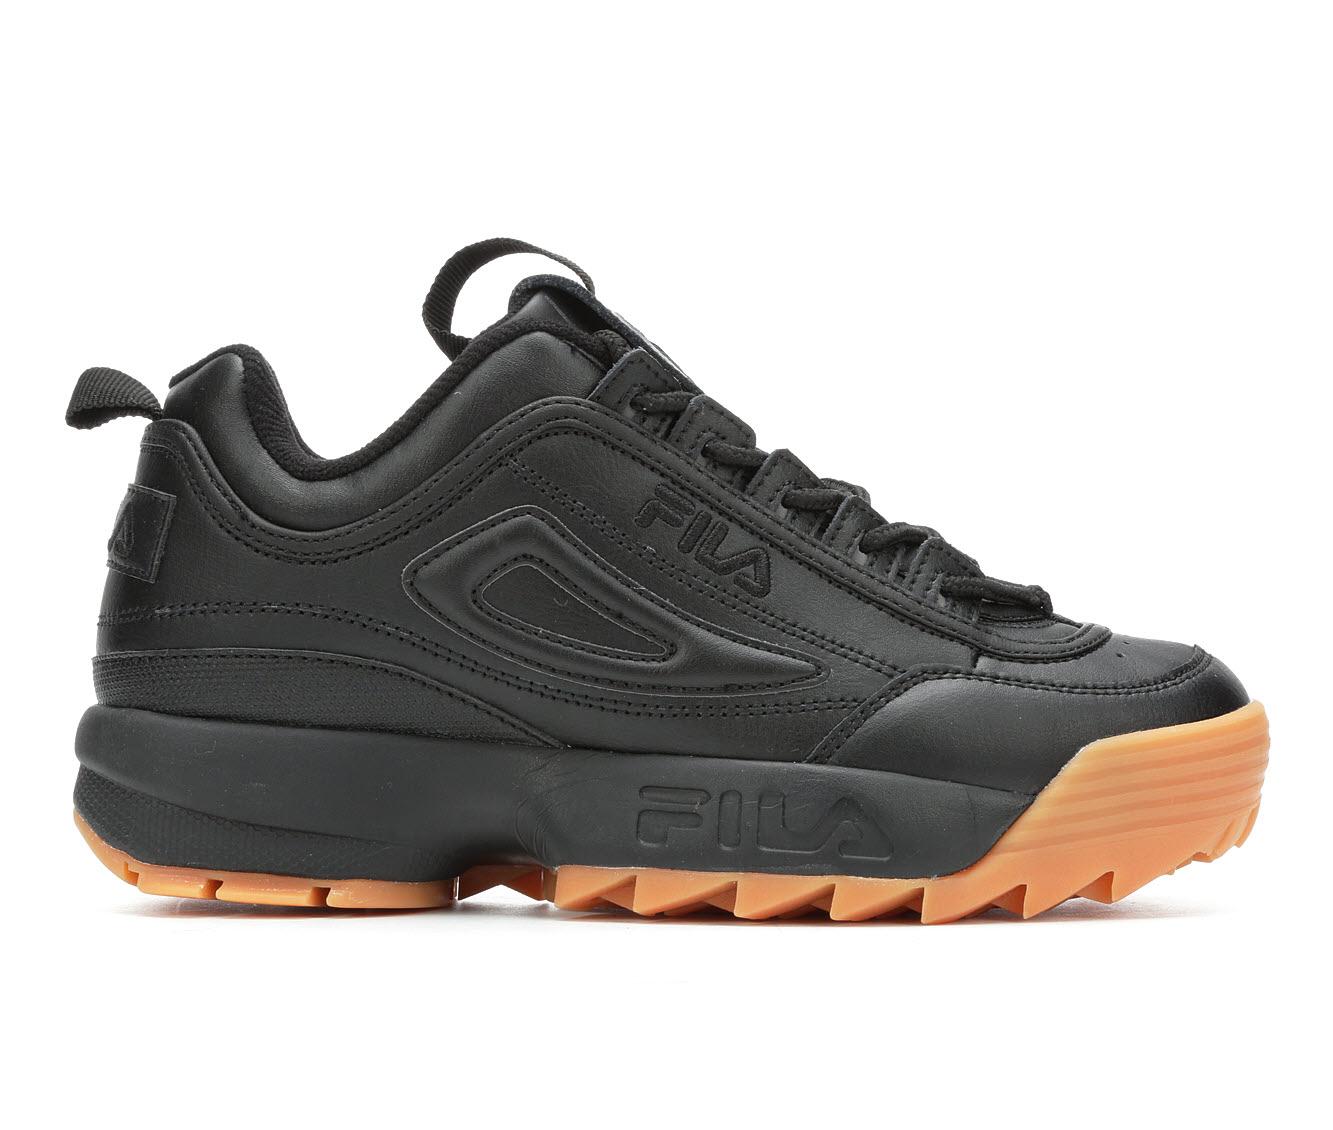 Fila Disruptor II Premium Women's Athletic Shoe (Black)